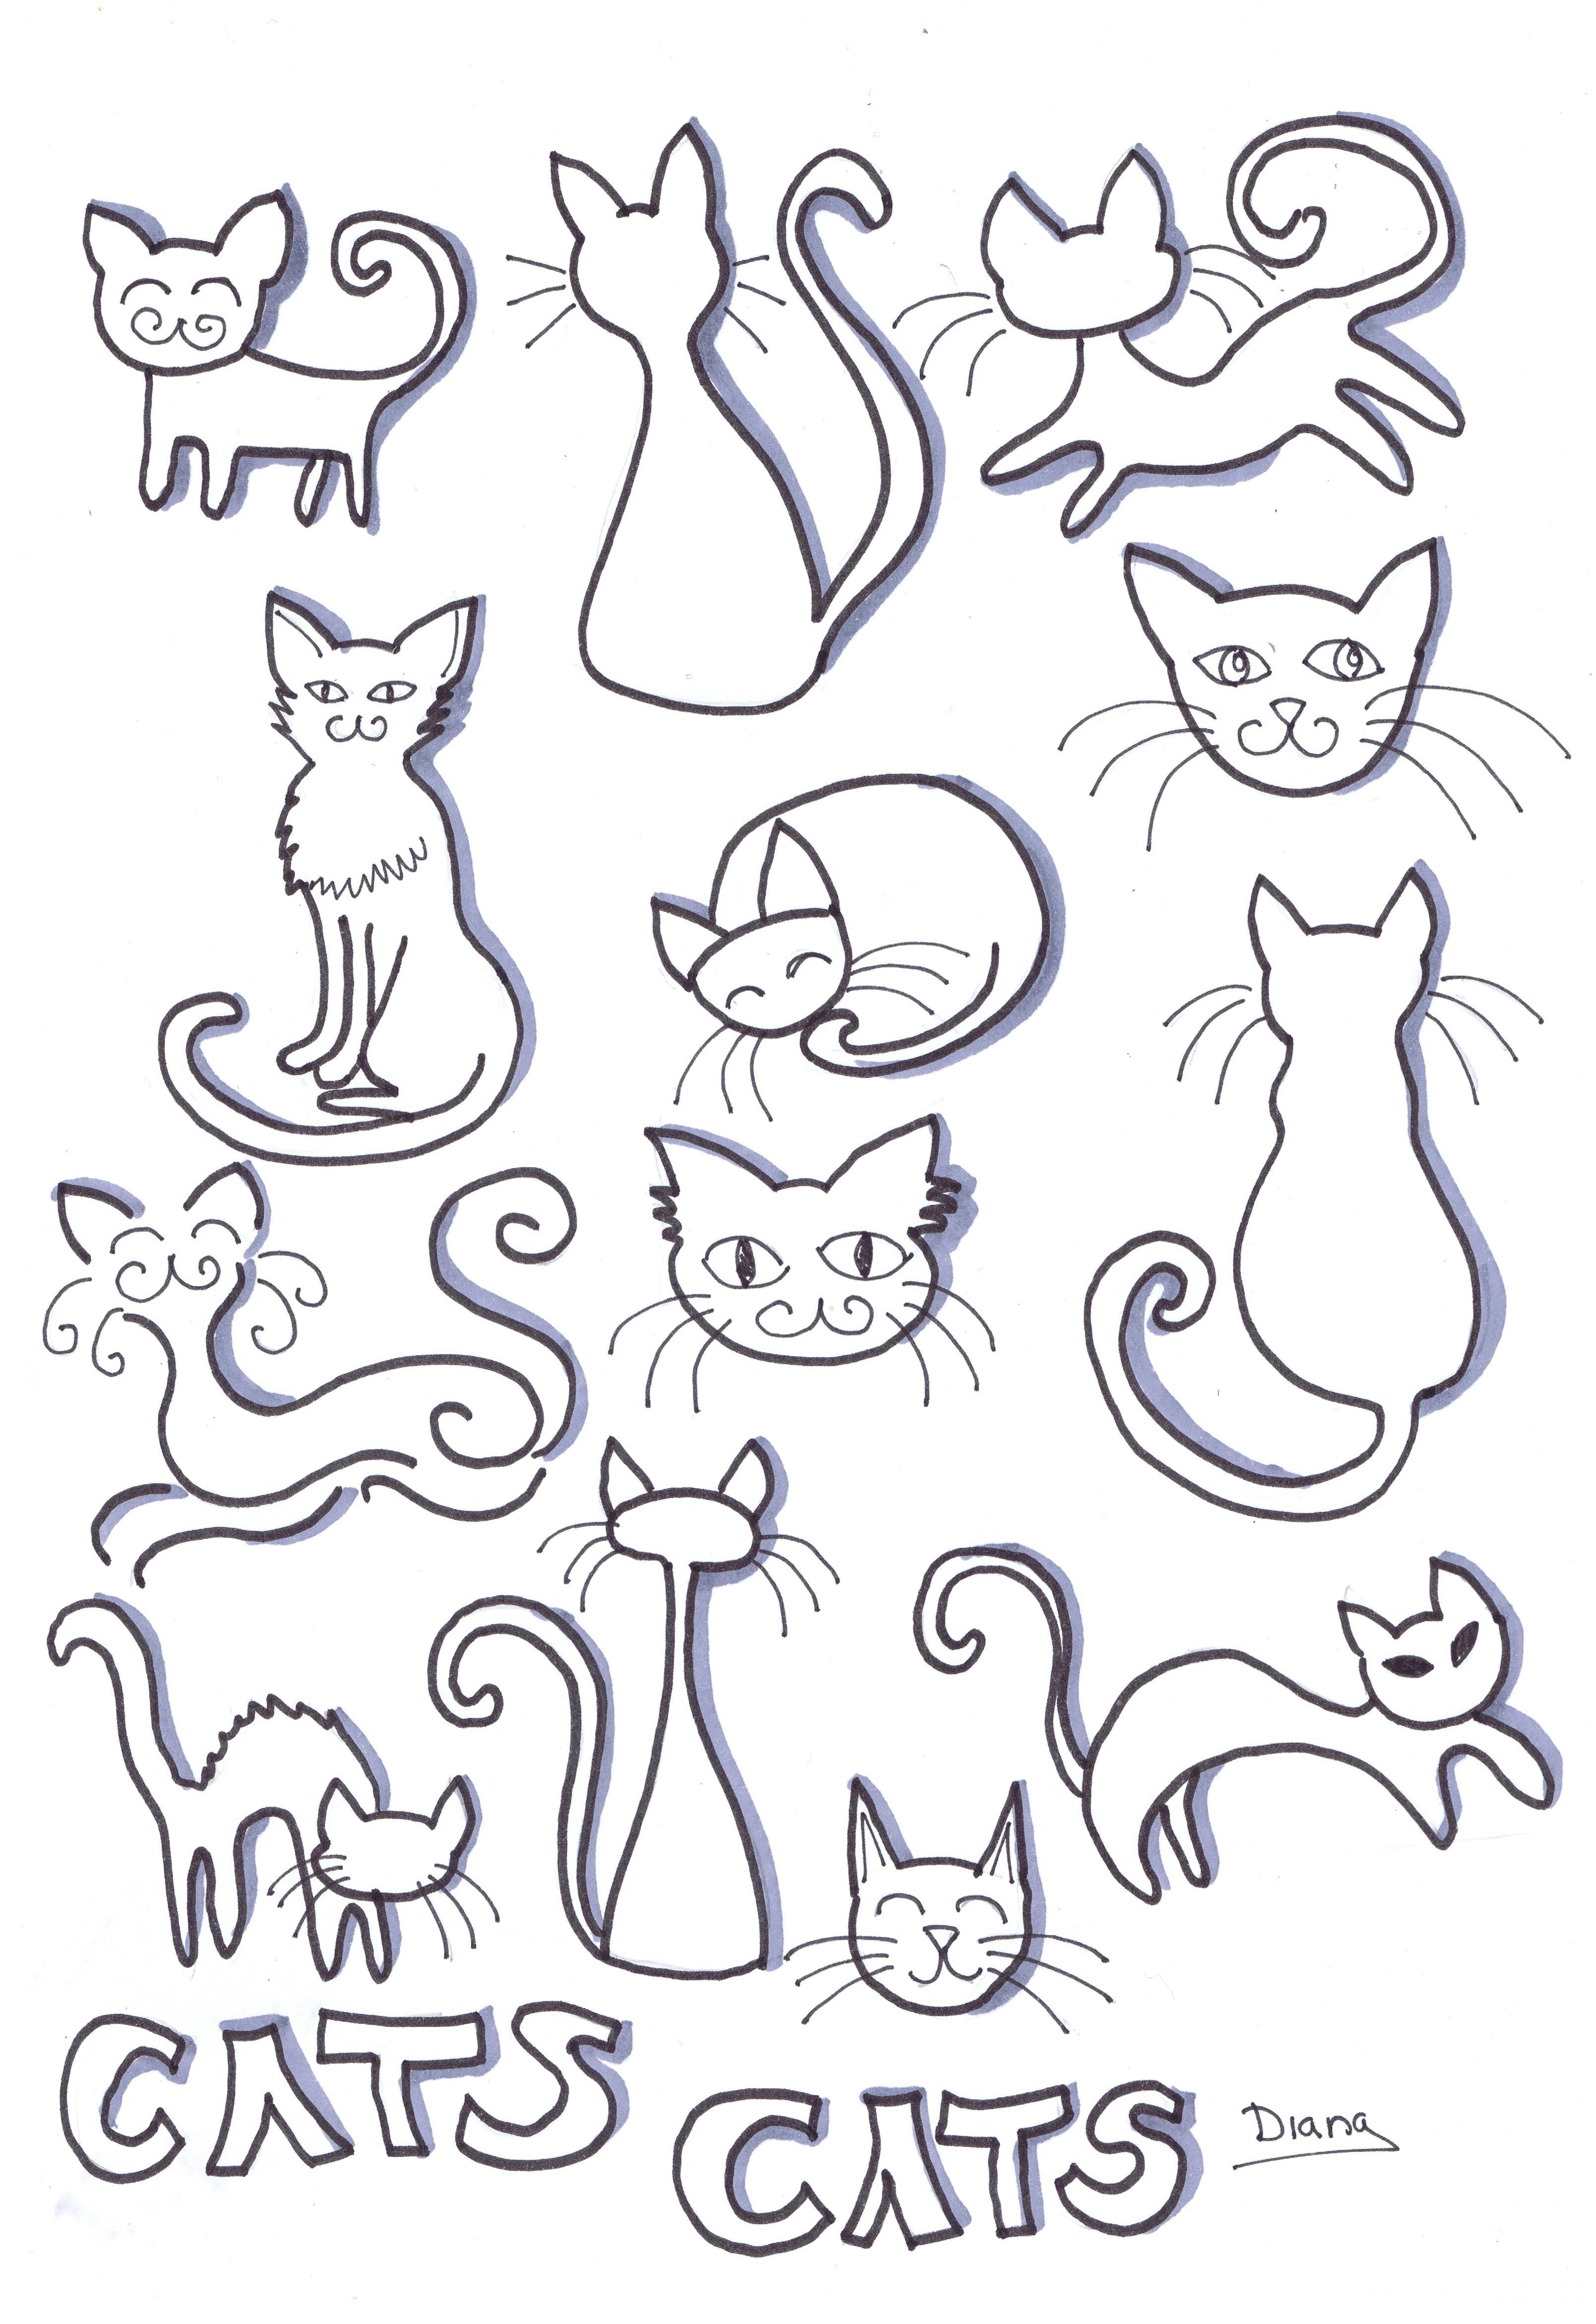 Episode 5. Gatos, cats, minimos, gats, gatti, chats, katzen... http://unacassaenlalunna.wordpress.com/2014/06/24/episode-5-gatos-cats-minimos-gats-gatti-chats-katzen/